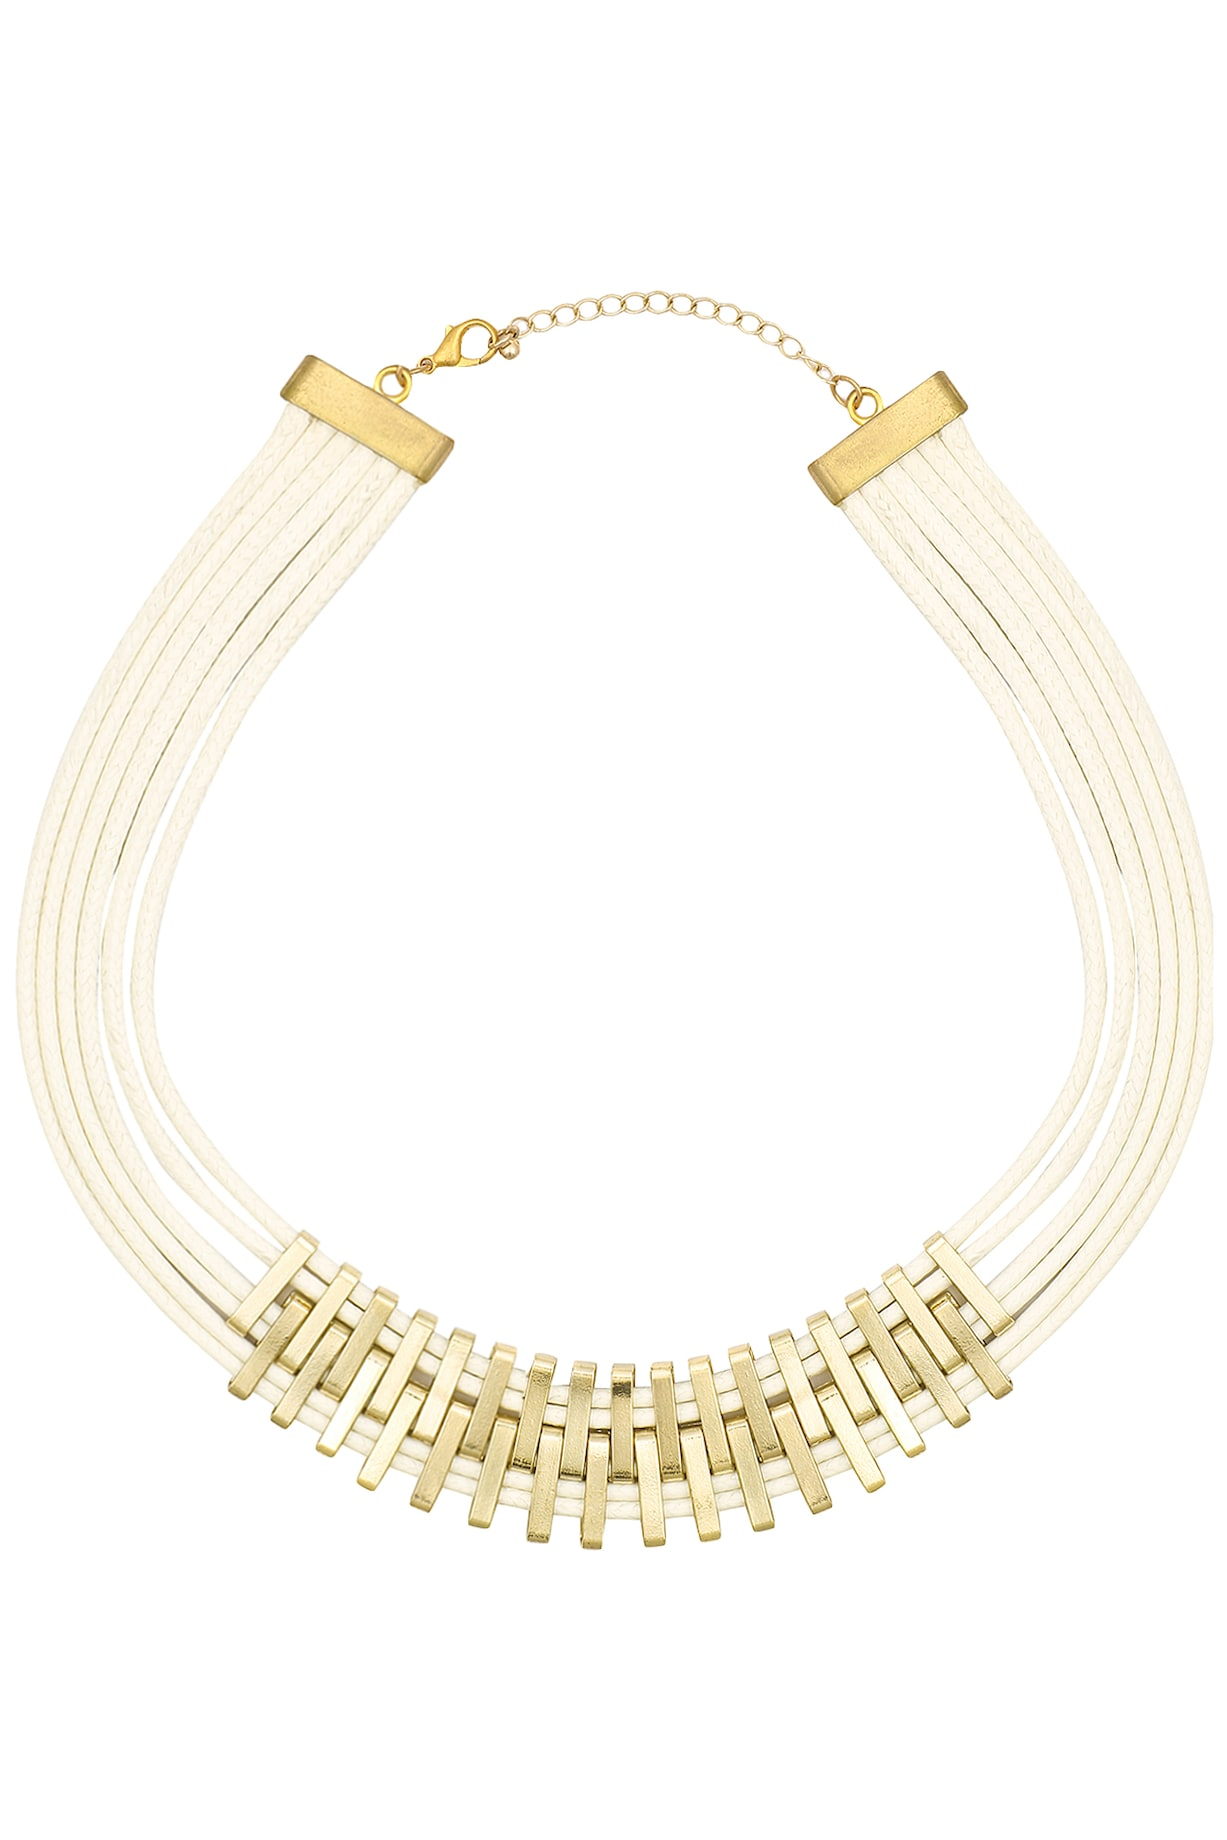 Aurum Chakra Necklaces